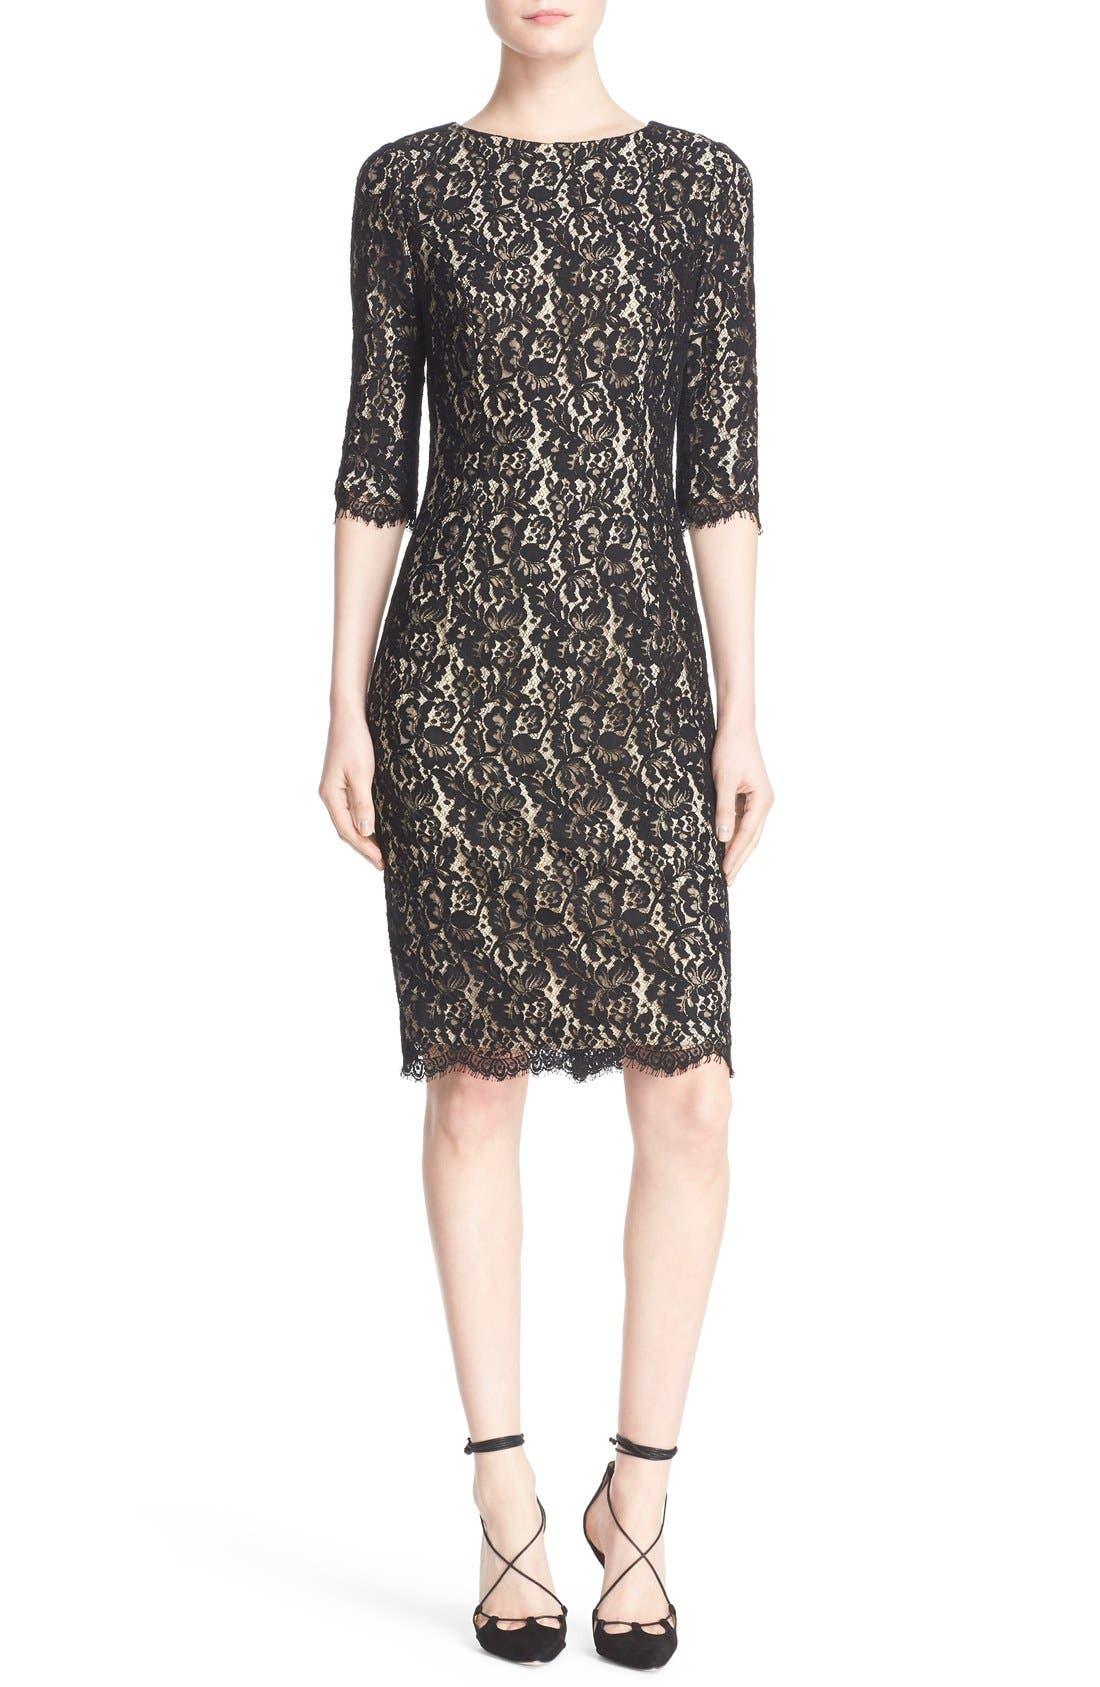 Alternate Image 1 Selected - Carolina Herrera Lace Cocktail Dress